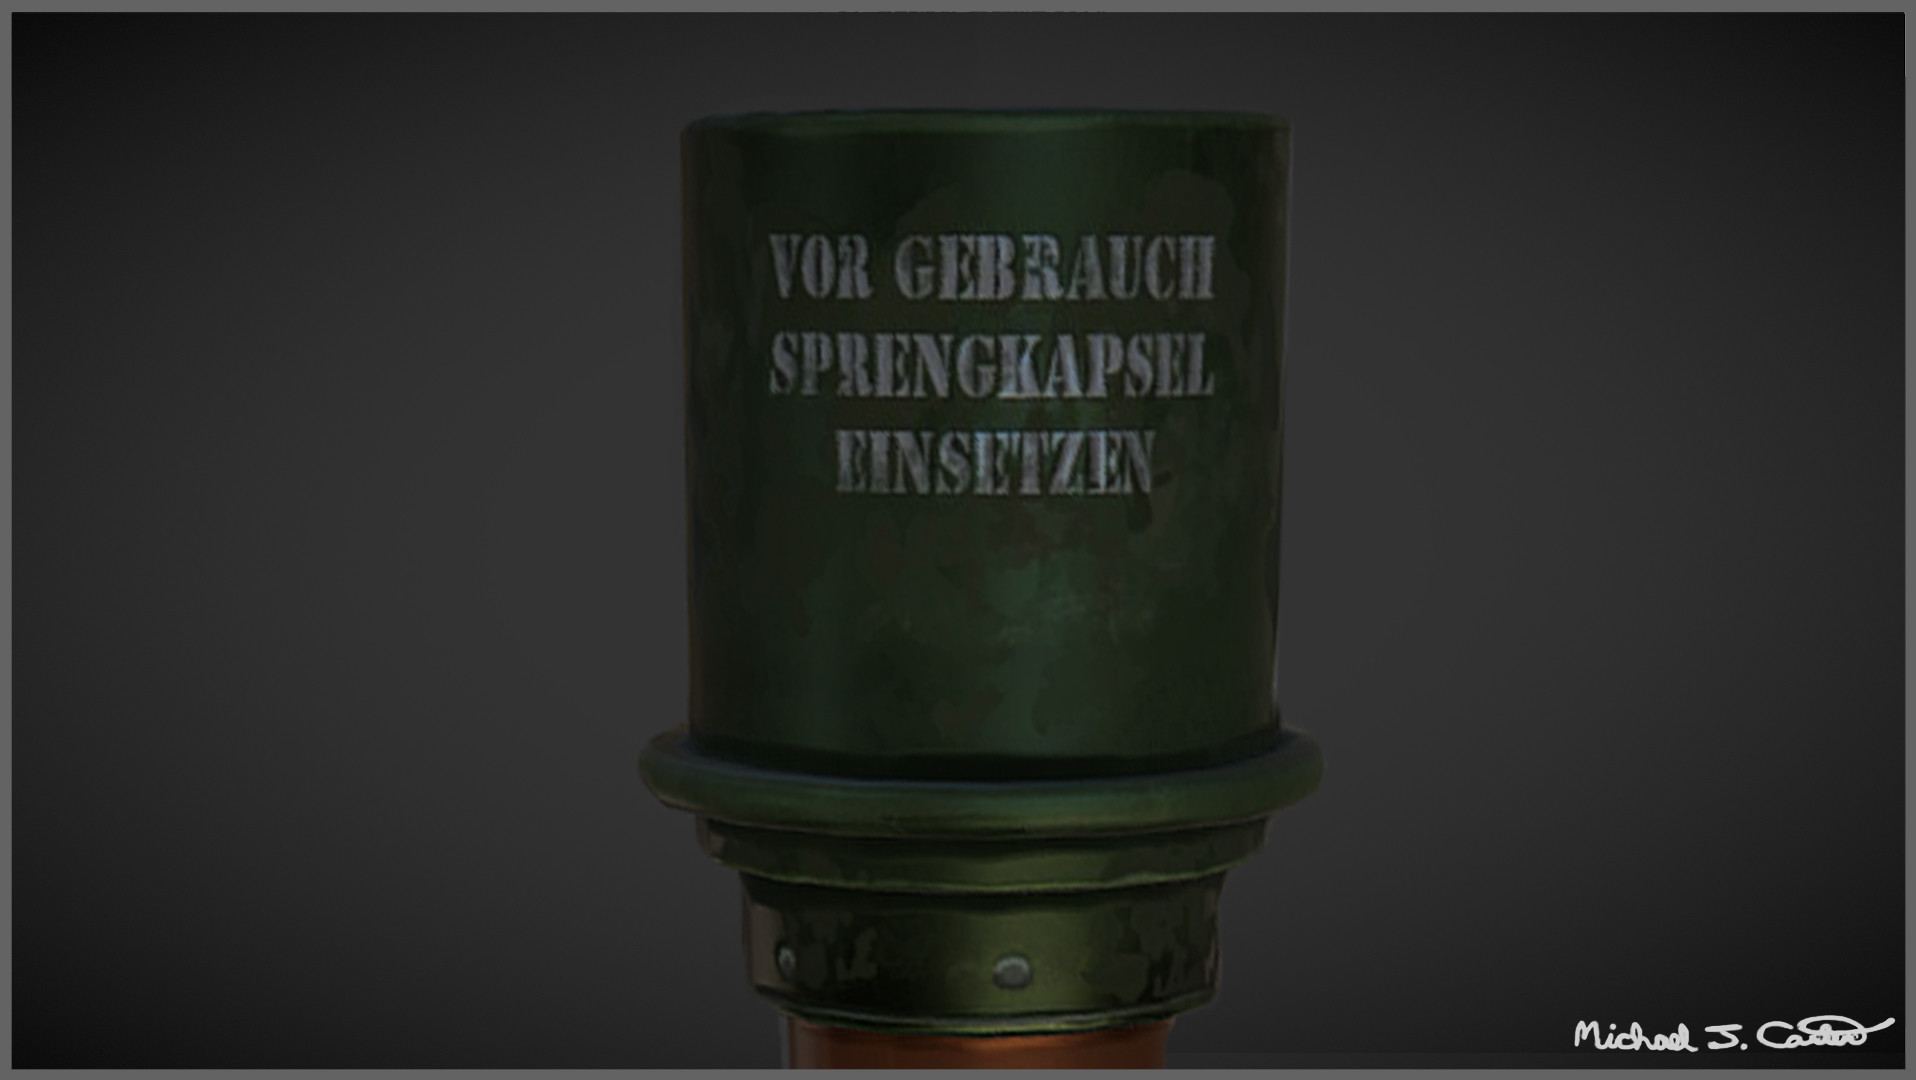 Michael jake carter mcarter stick grenade close up image